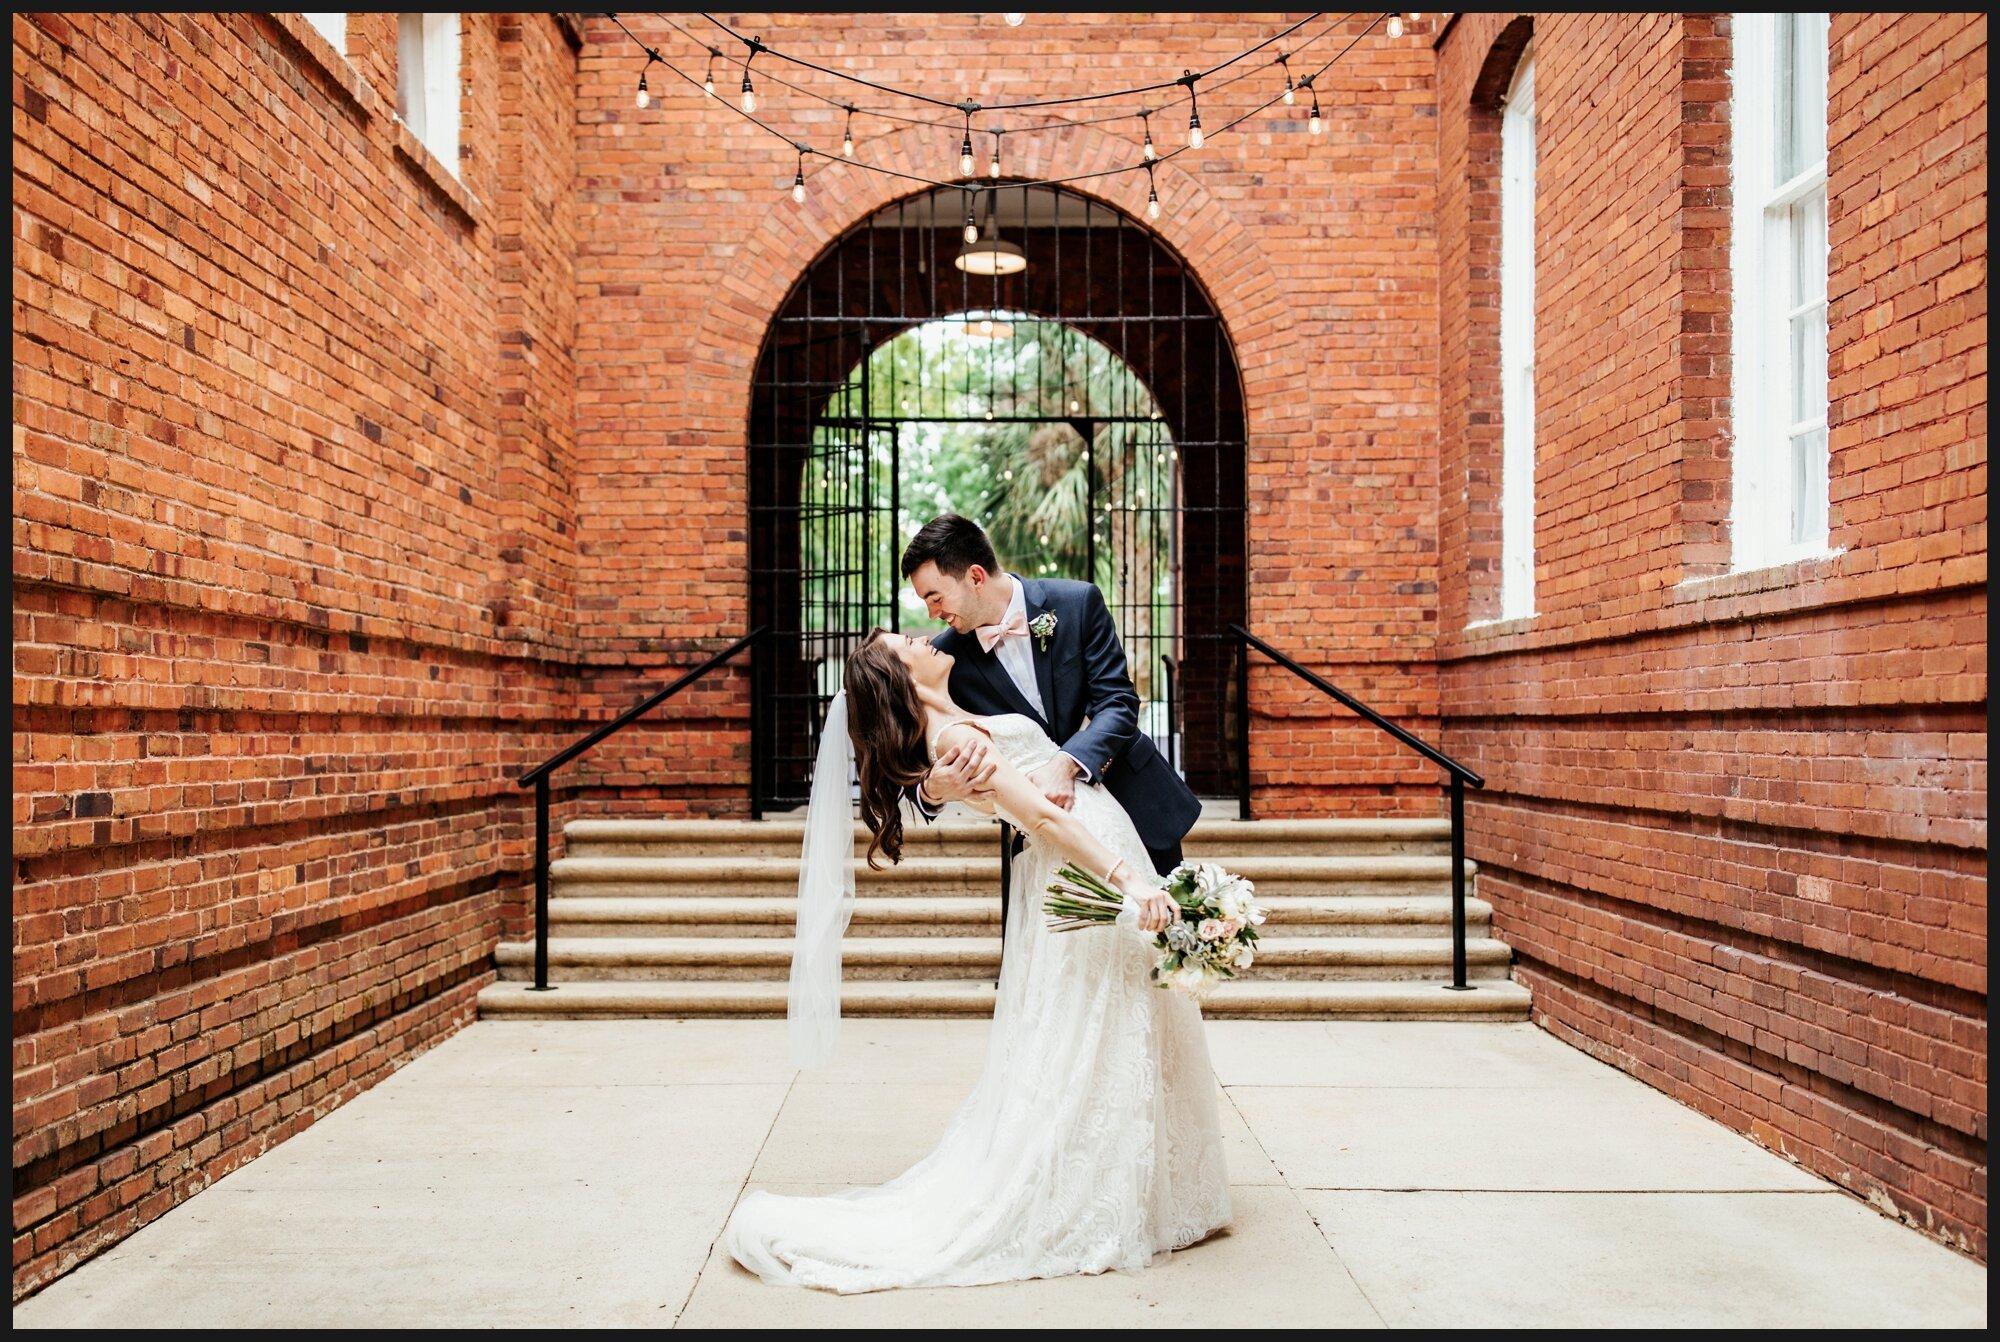 Orlando-Wedding-Photographer-destination-wedding-photographer-florida-wedding-photographer-hawaii-wedding-photographer_0685.jpg